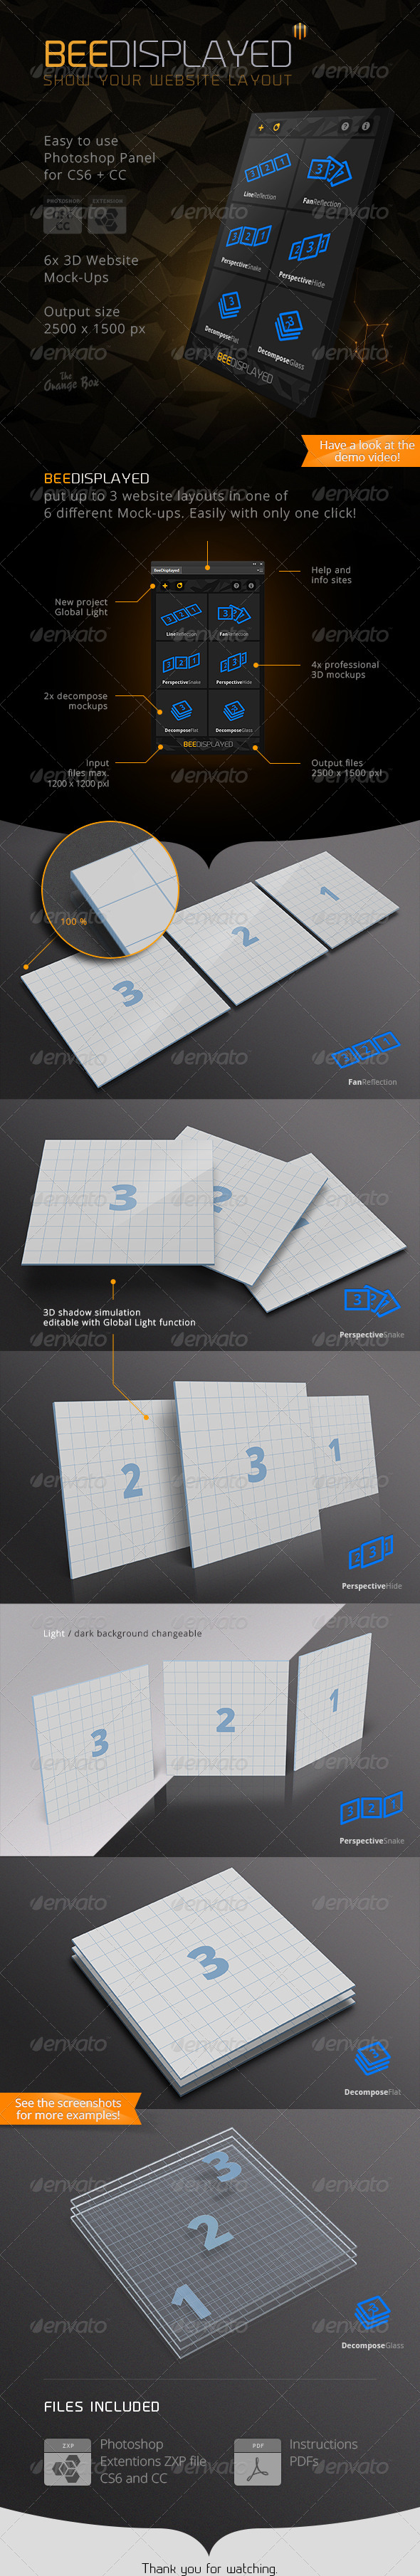 GraphicRiver BeeDisplayed Present your Website Layout Panel 6650842